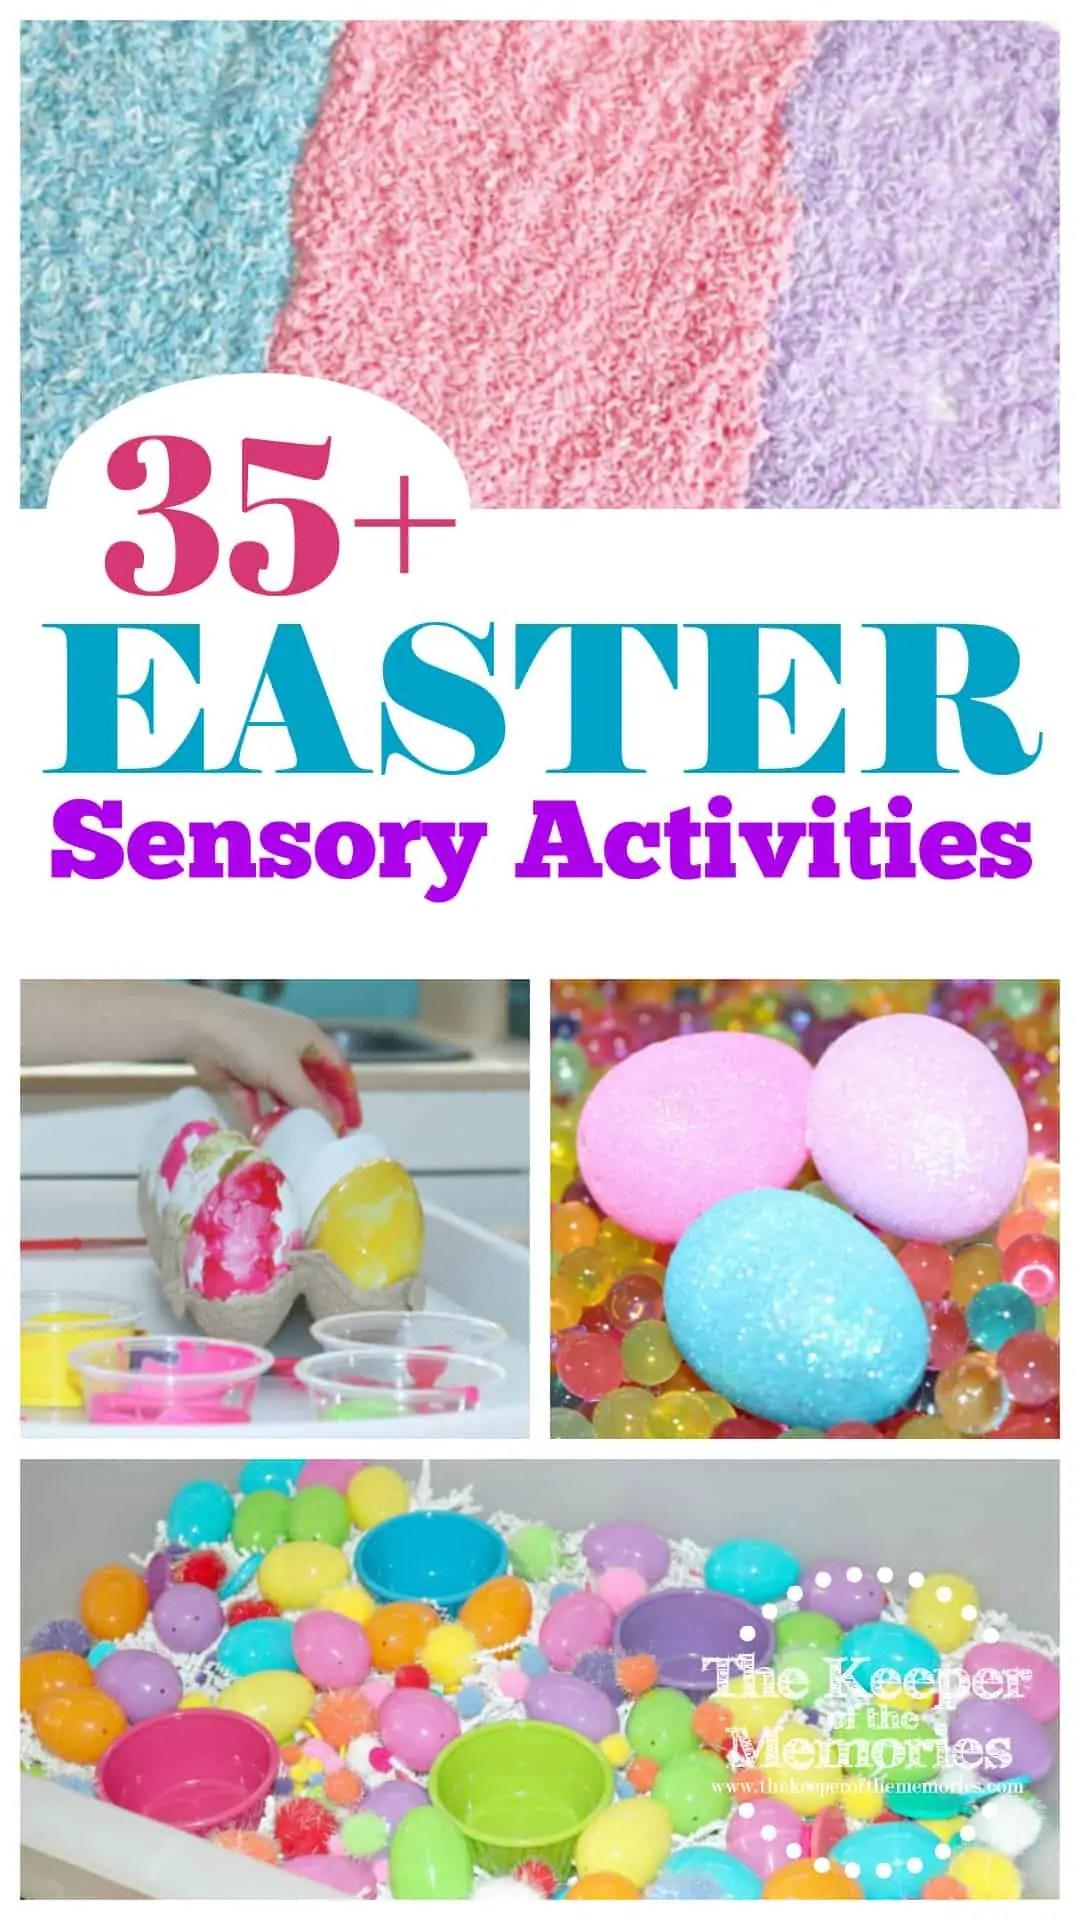 35 Easter Sensory Activities For Little Kids